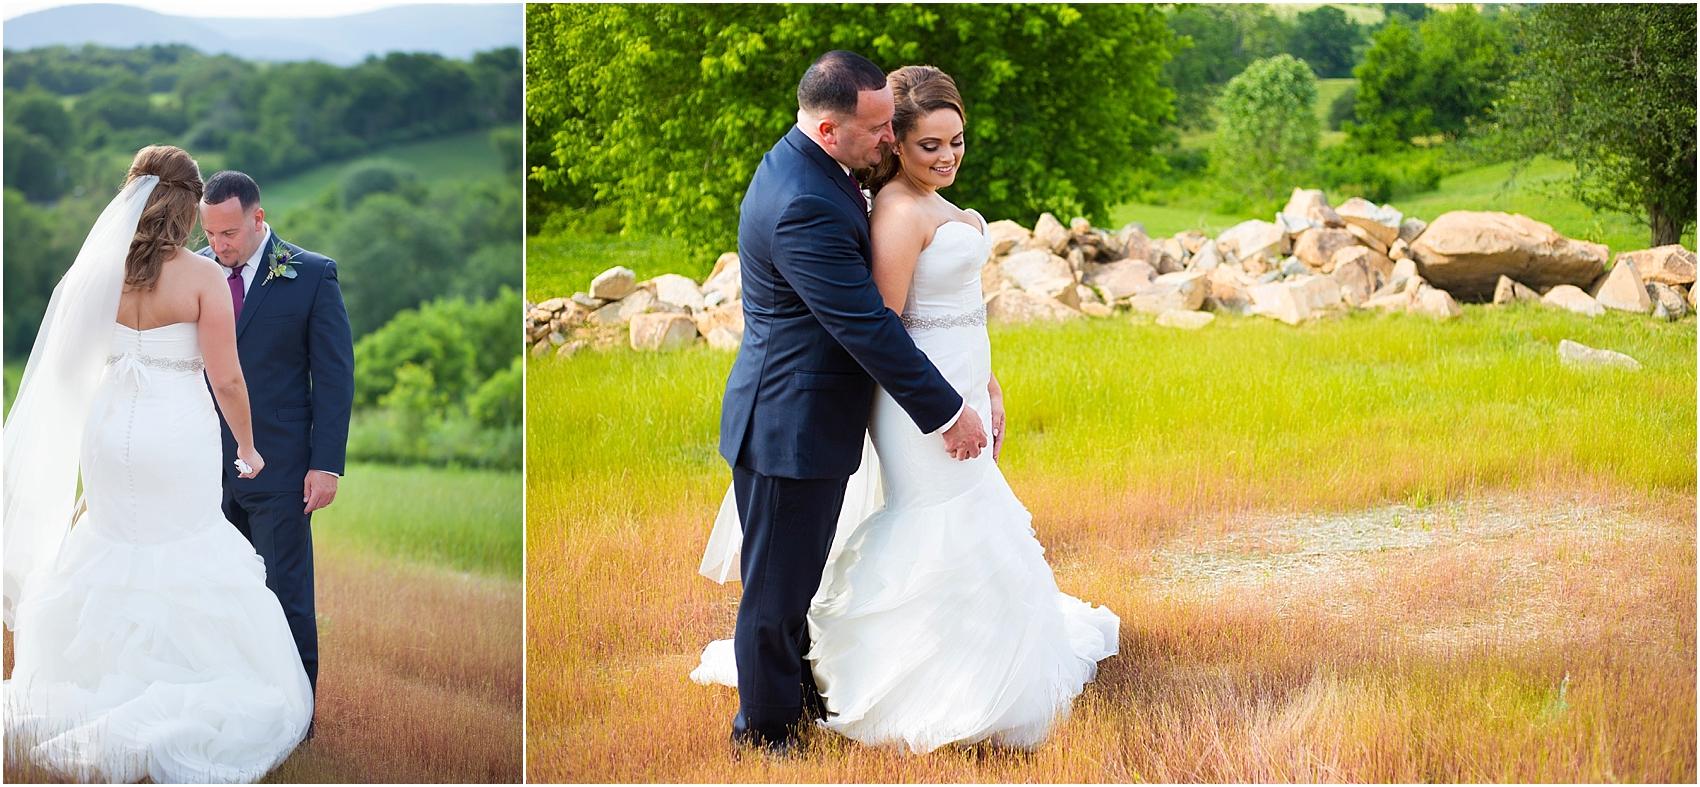 Blue Valley Winery Wedding Feather n Oak Photography_0026.jpg